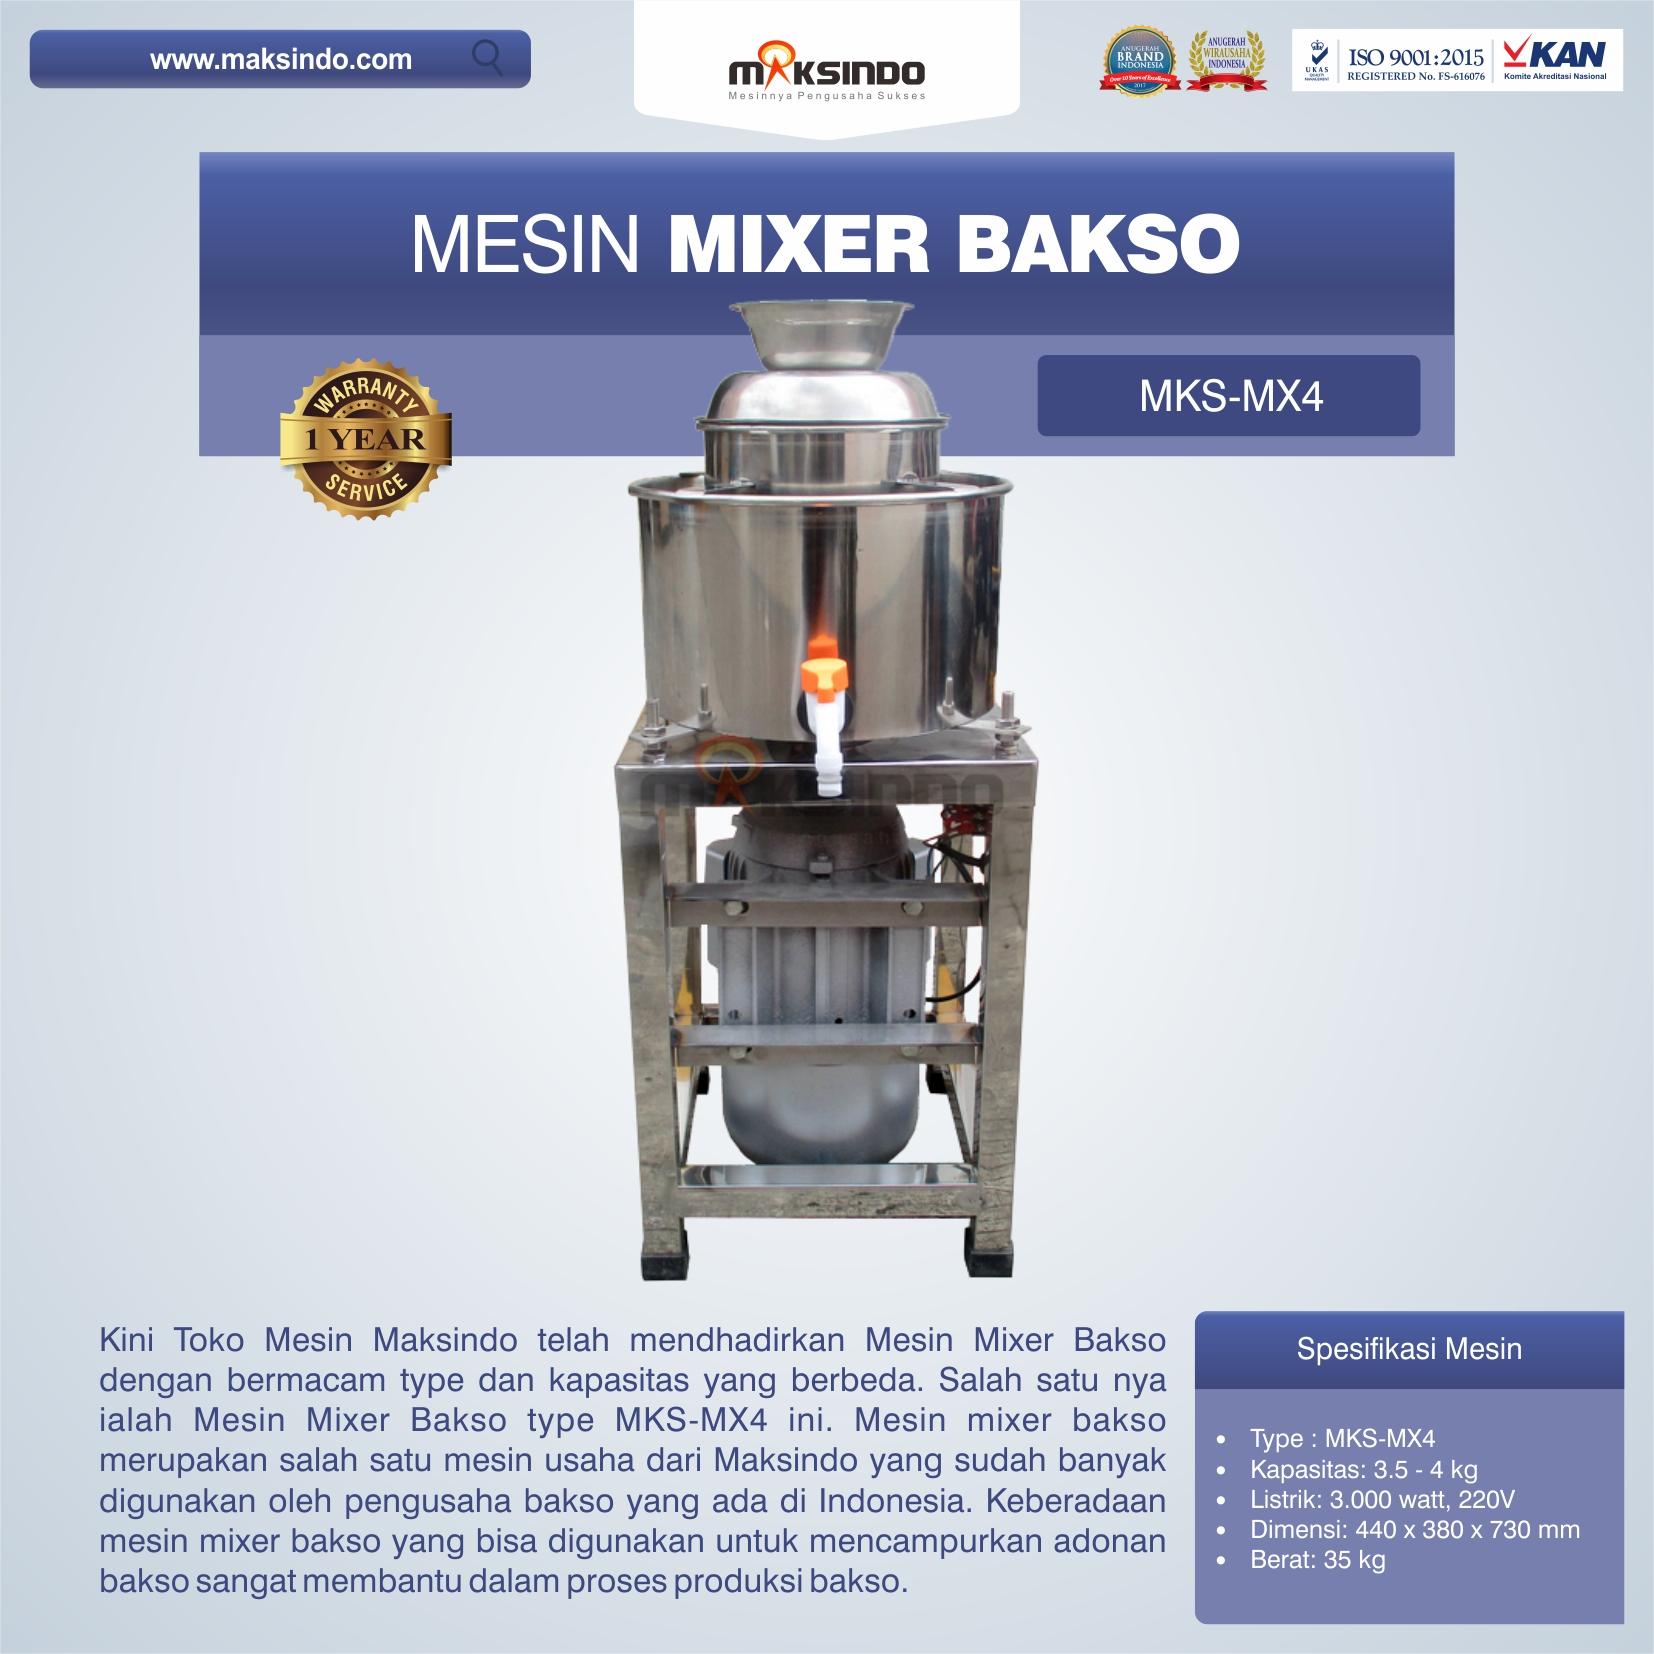 Jual Mesin Mixer Bakso MKS-MX4 di Palembang